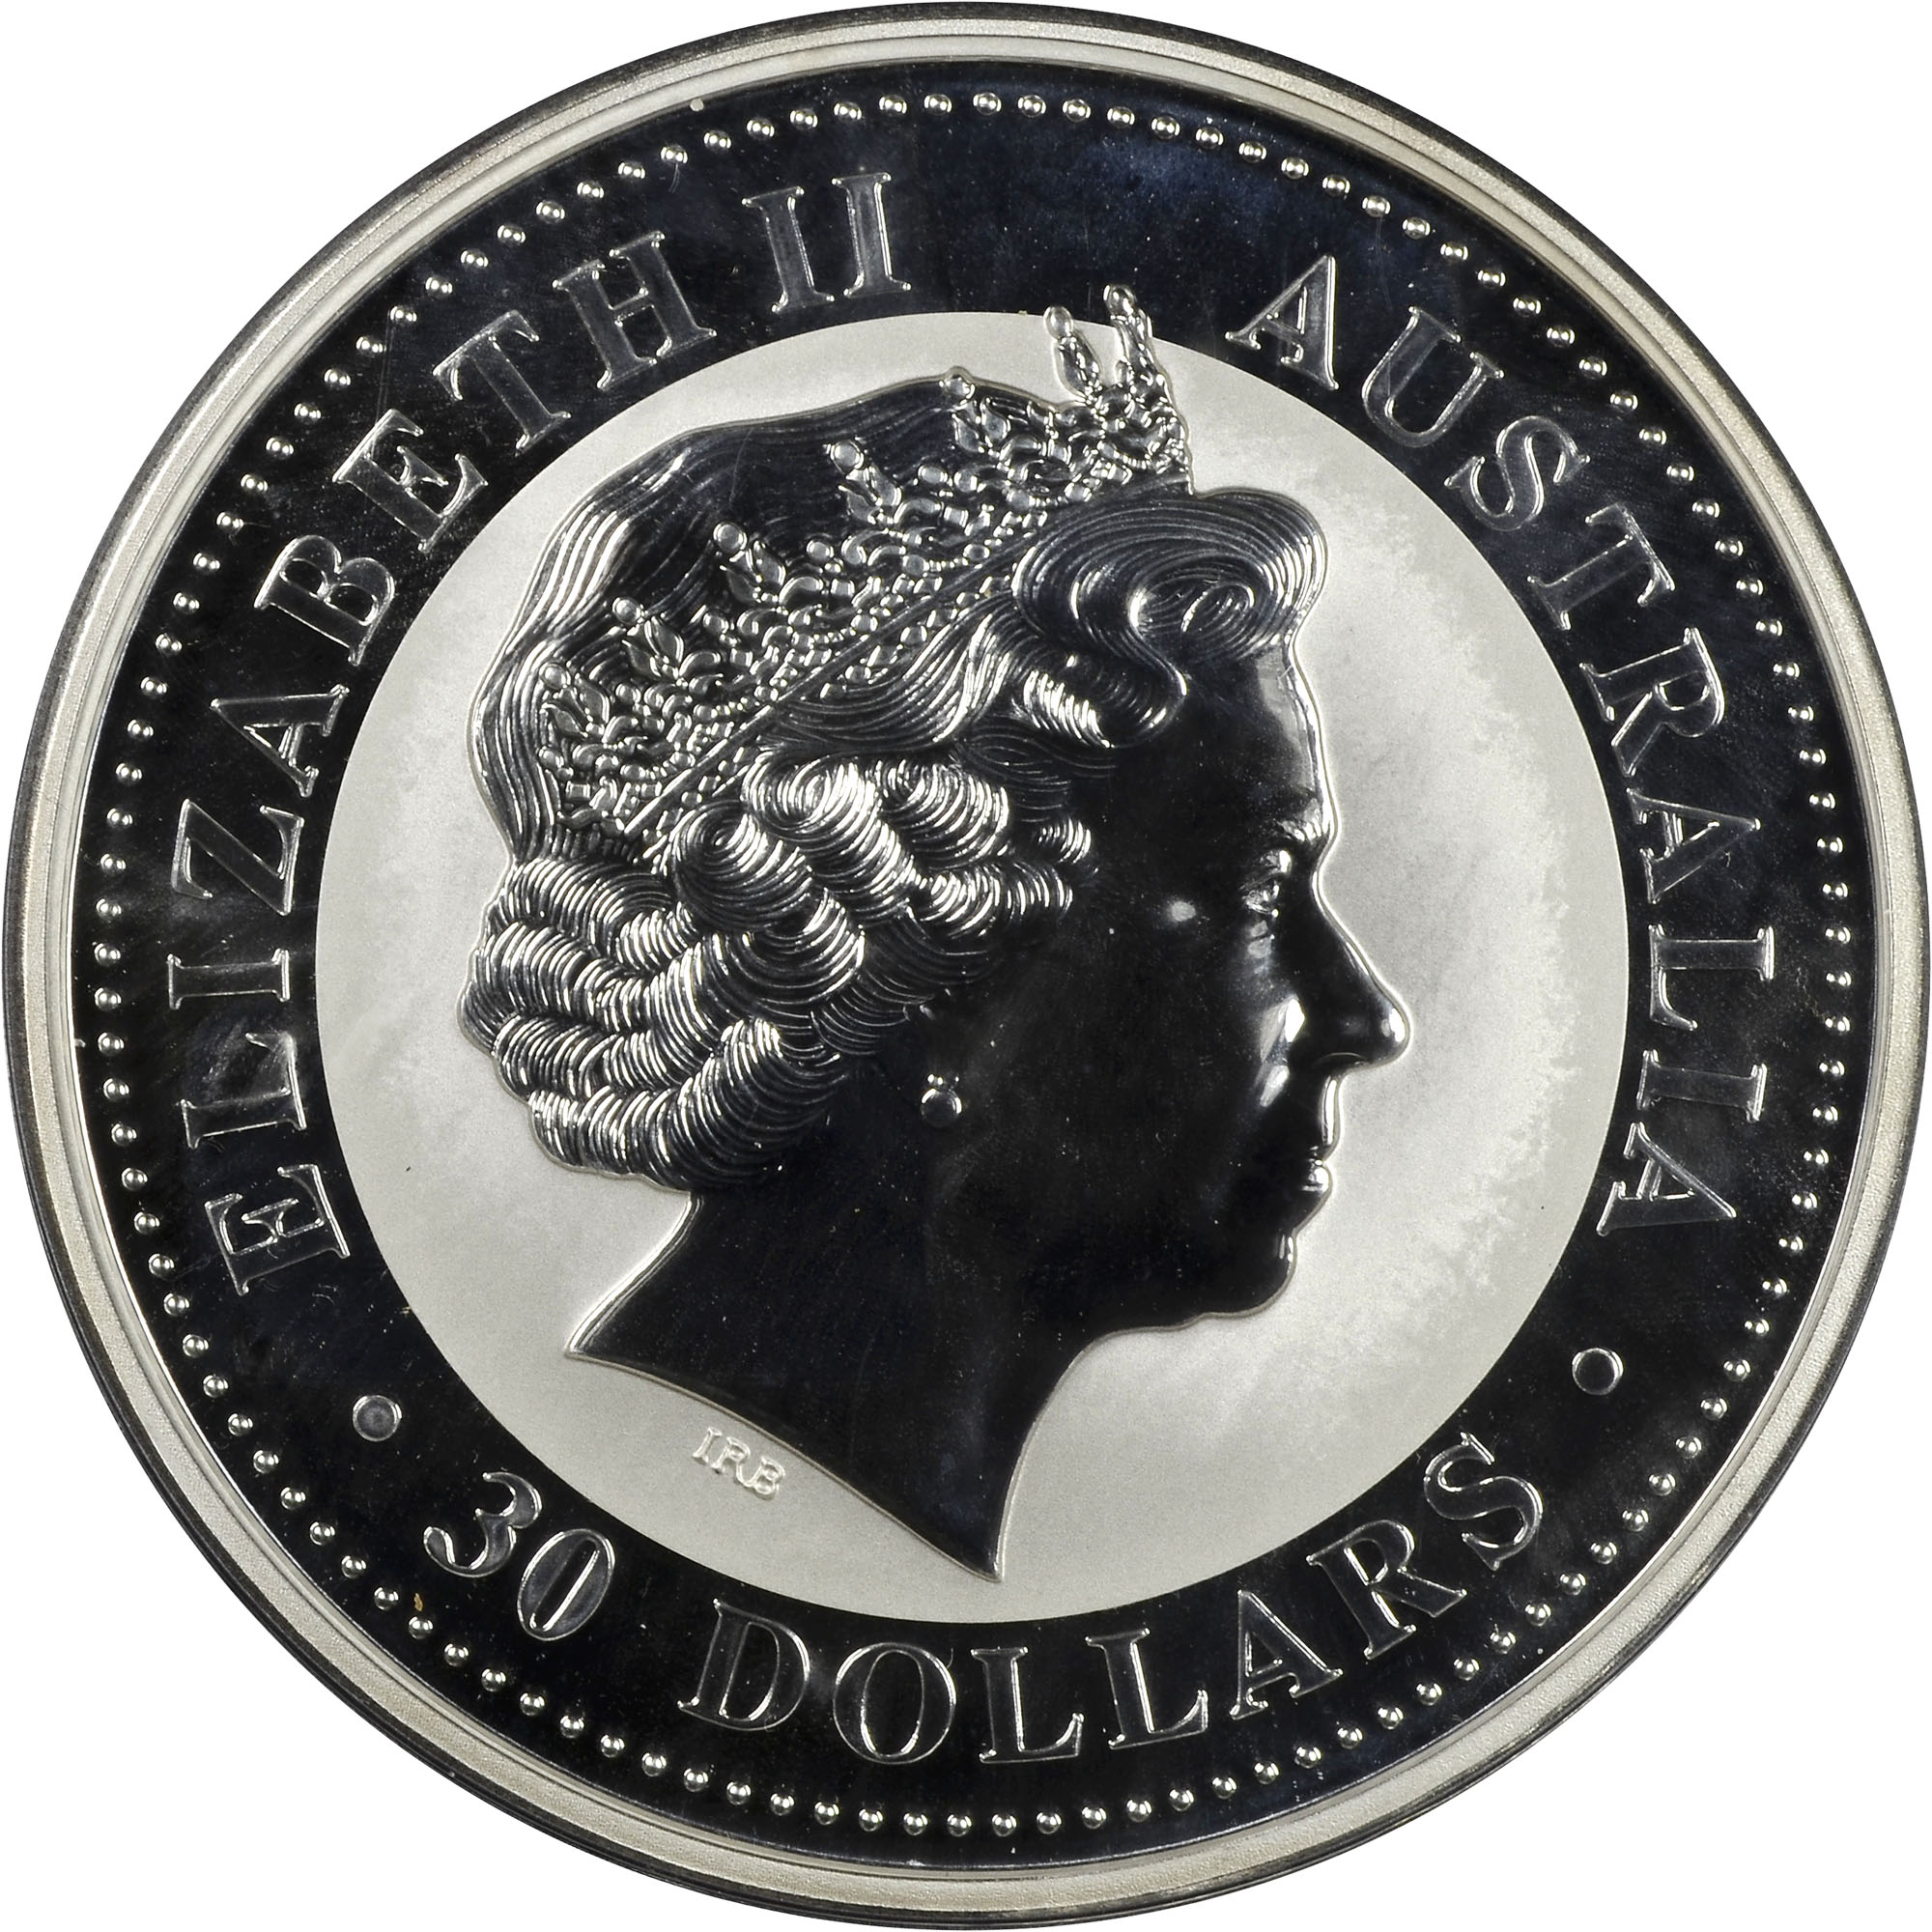 2004 Australia 30 Dollars obverse